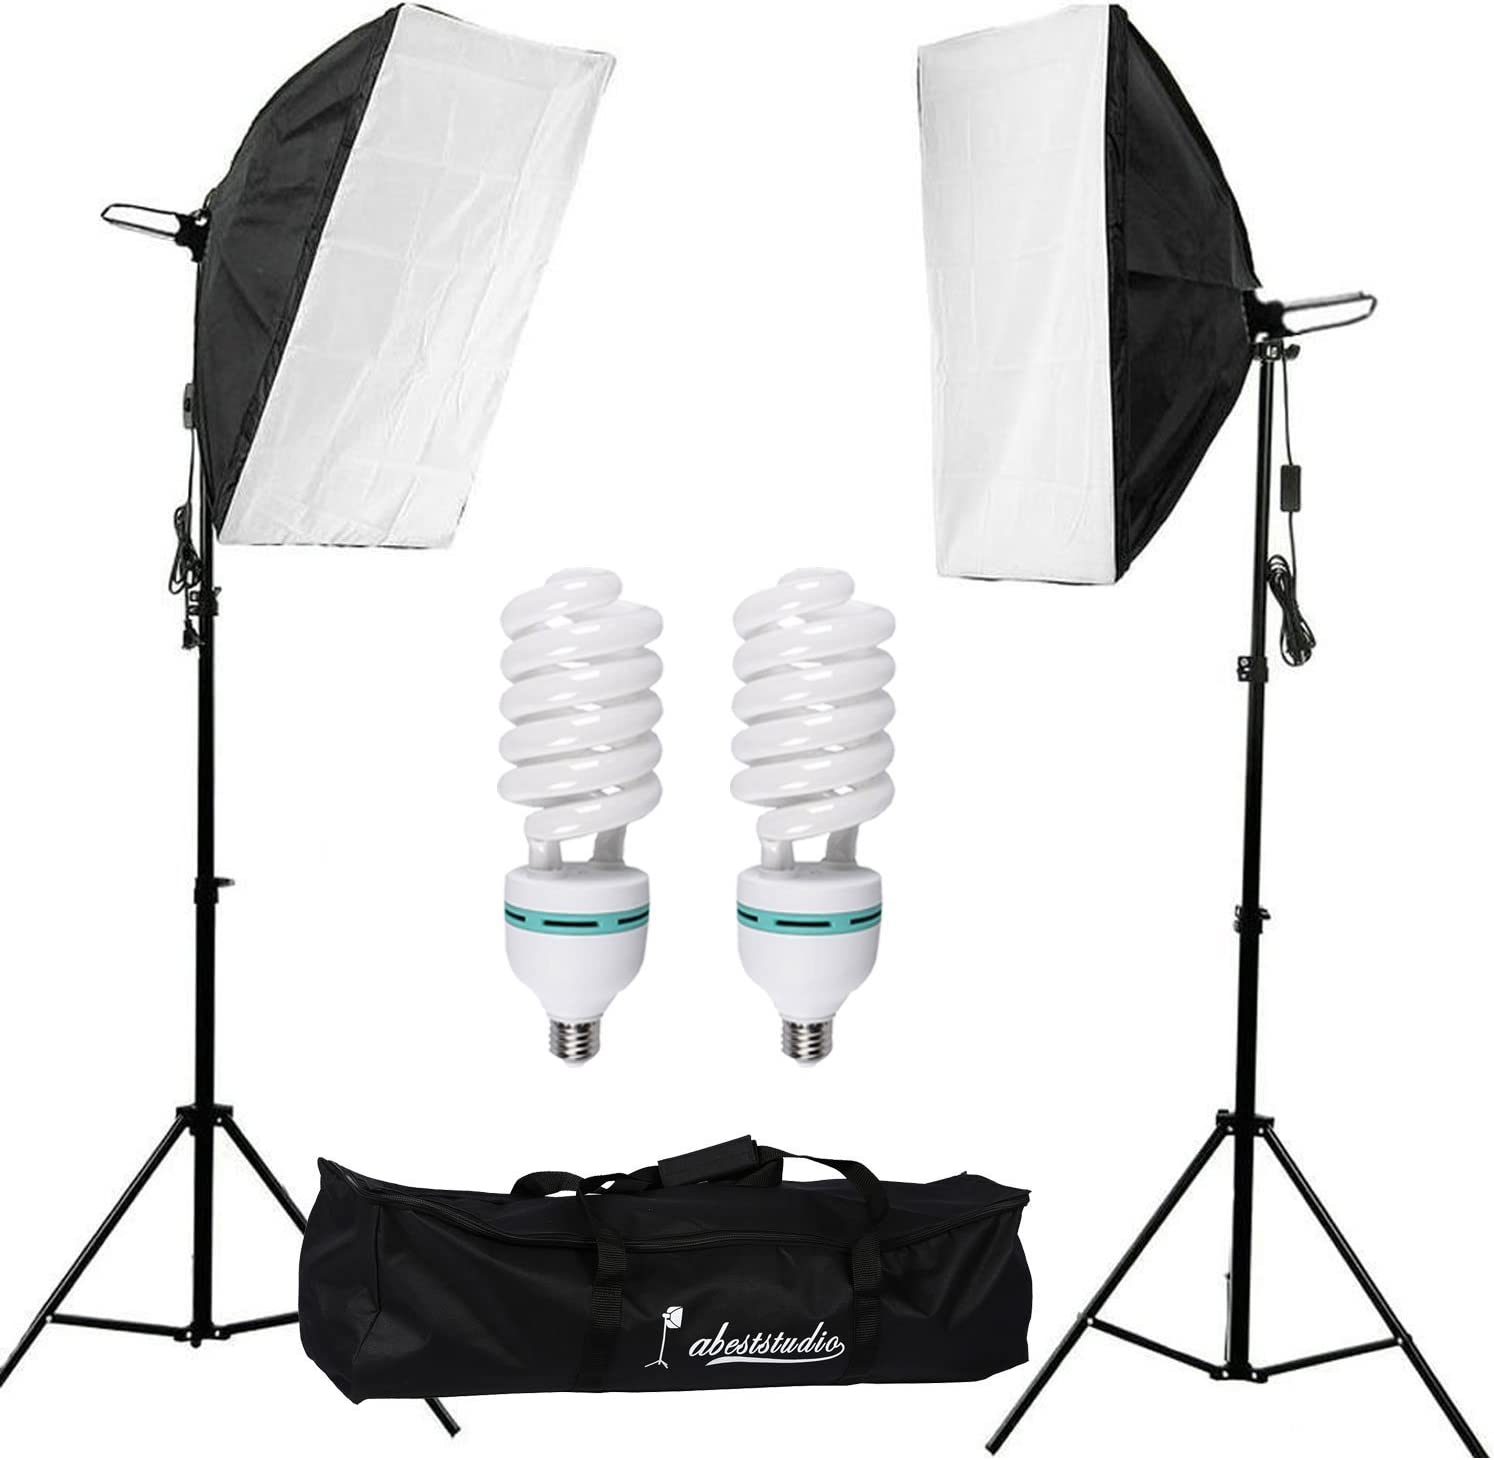 Photography Photo Studio 24 x 36 Premium Softbox Reflector Continuous Lighting